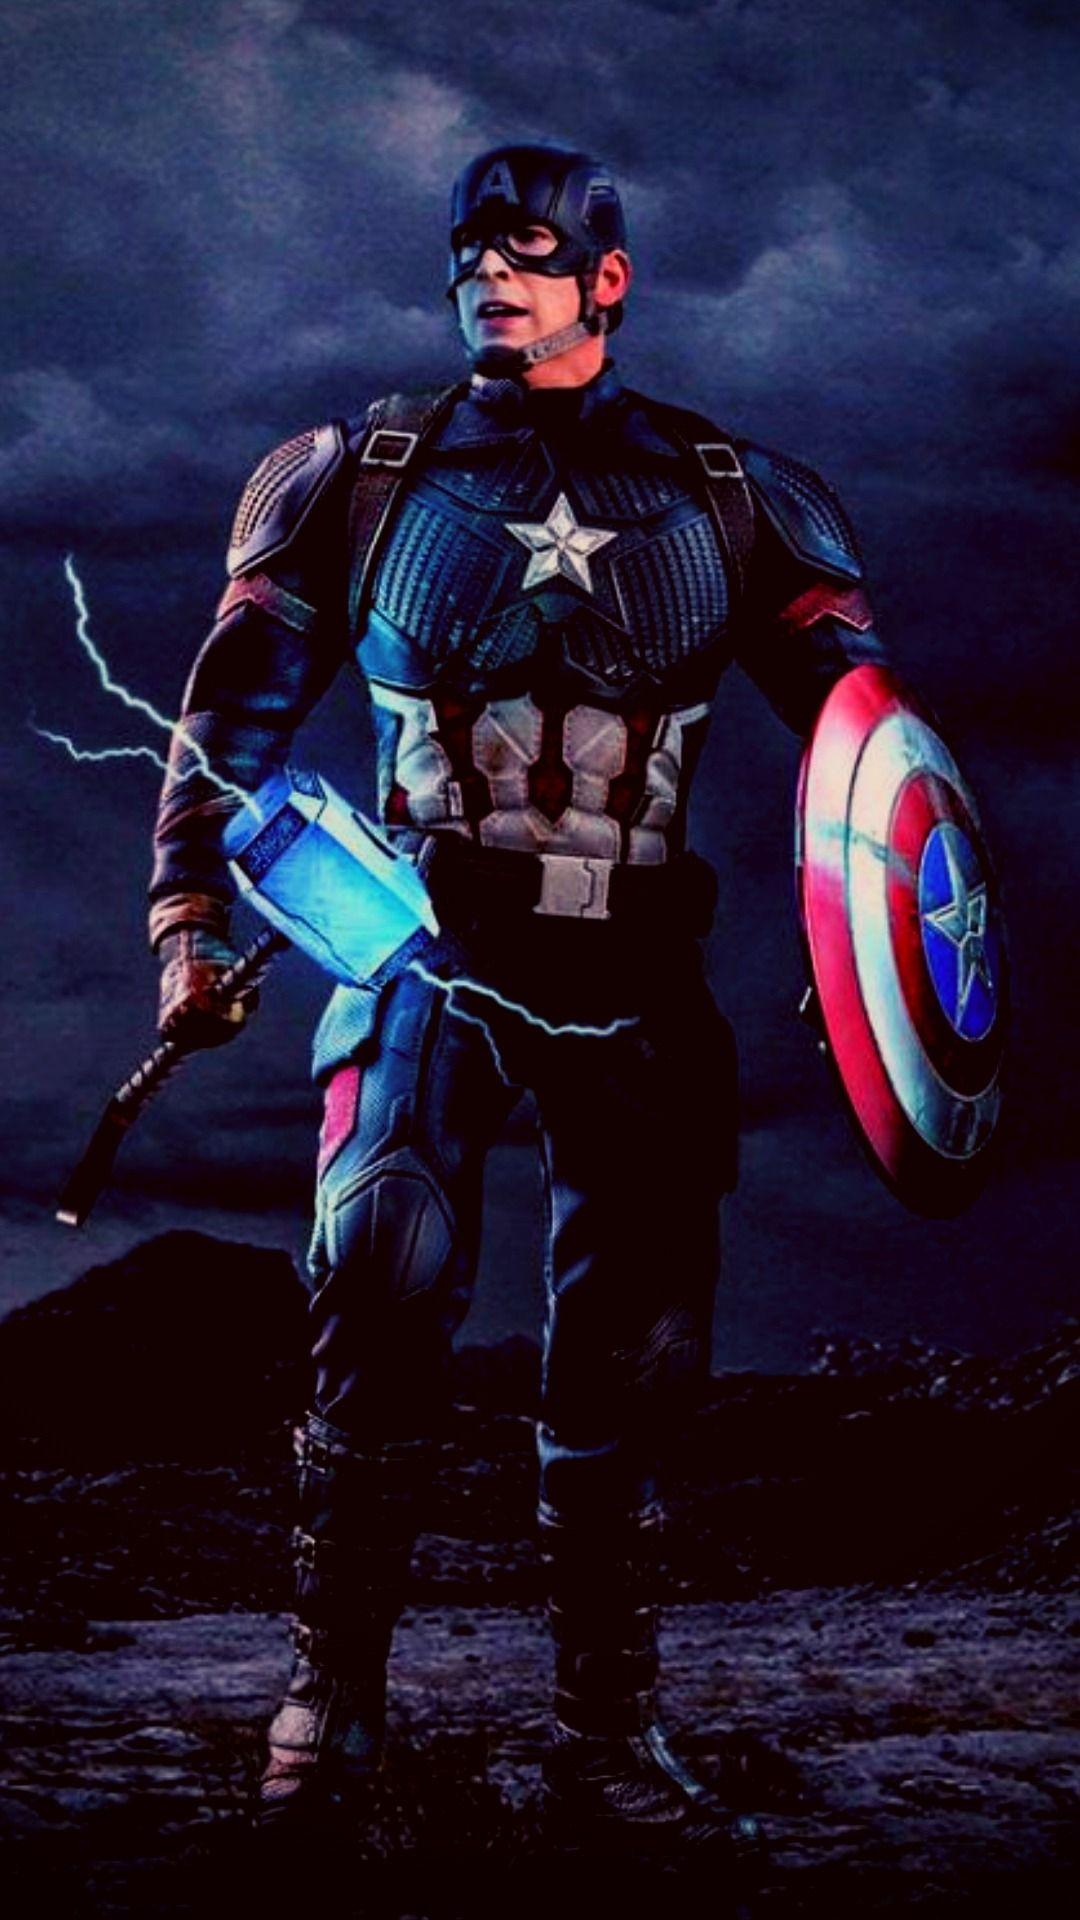 Best Hd Captain America Endgame Wallpapers Free Download Captain America Captain America Wallpaper Iphone Wallpaper World